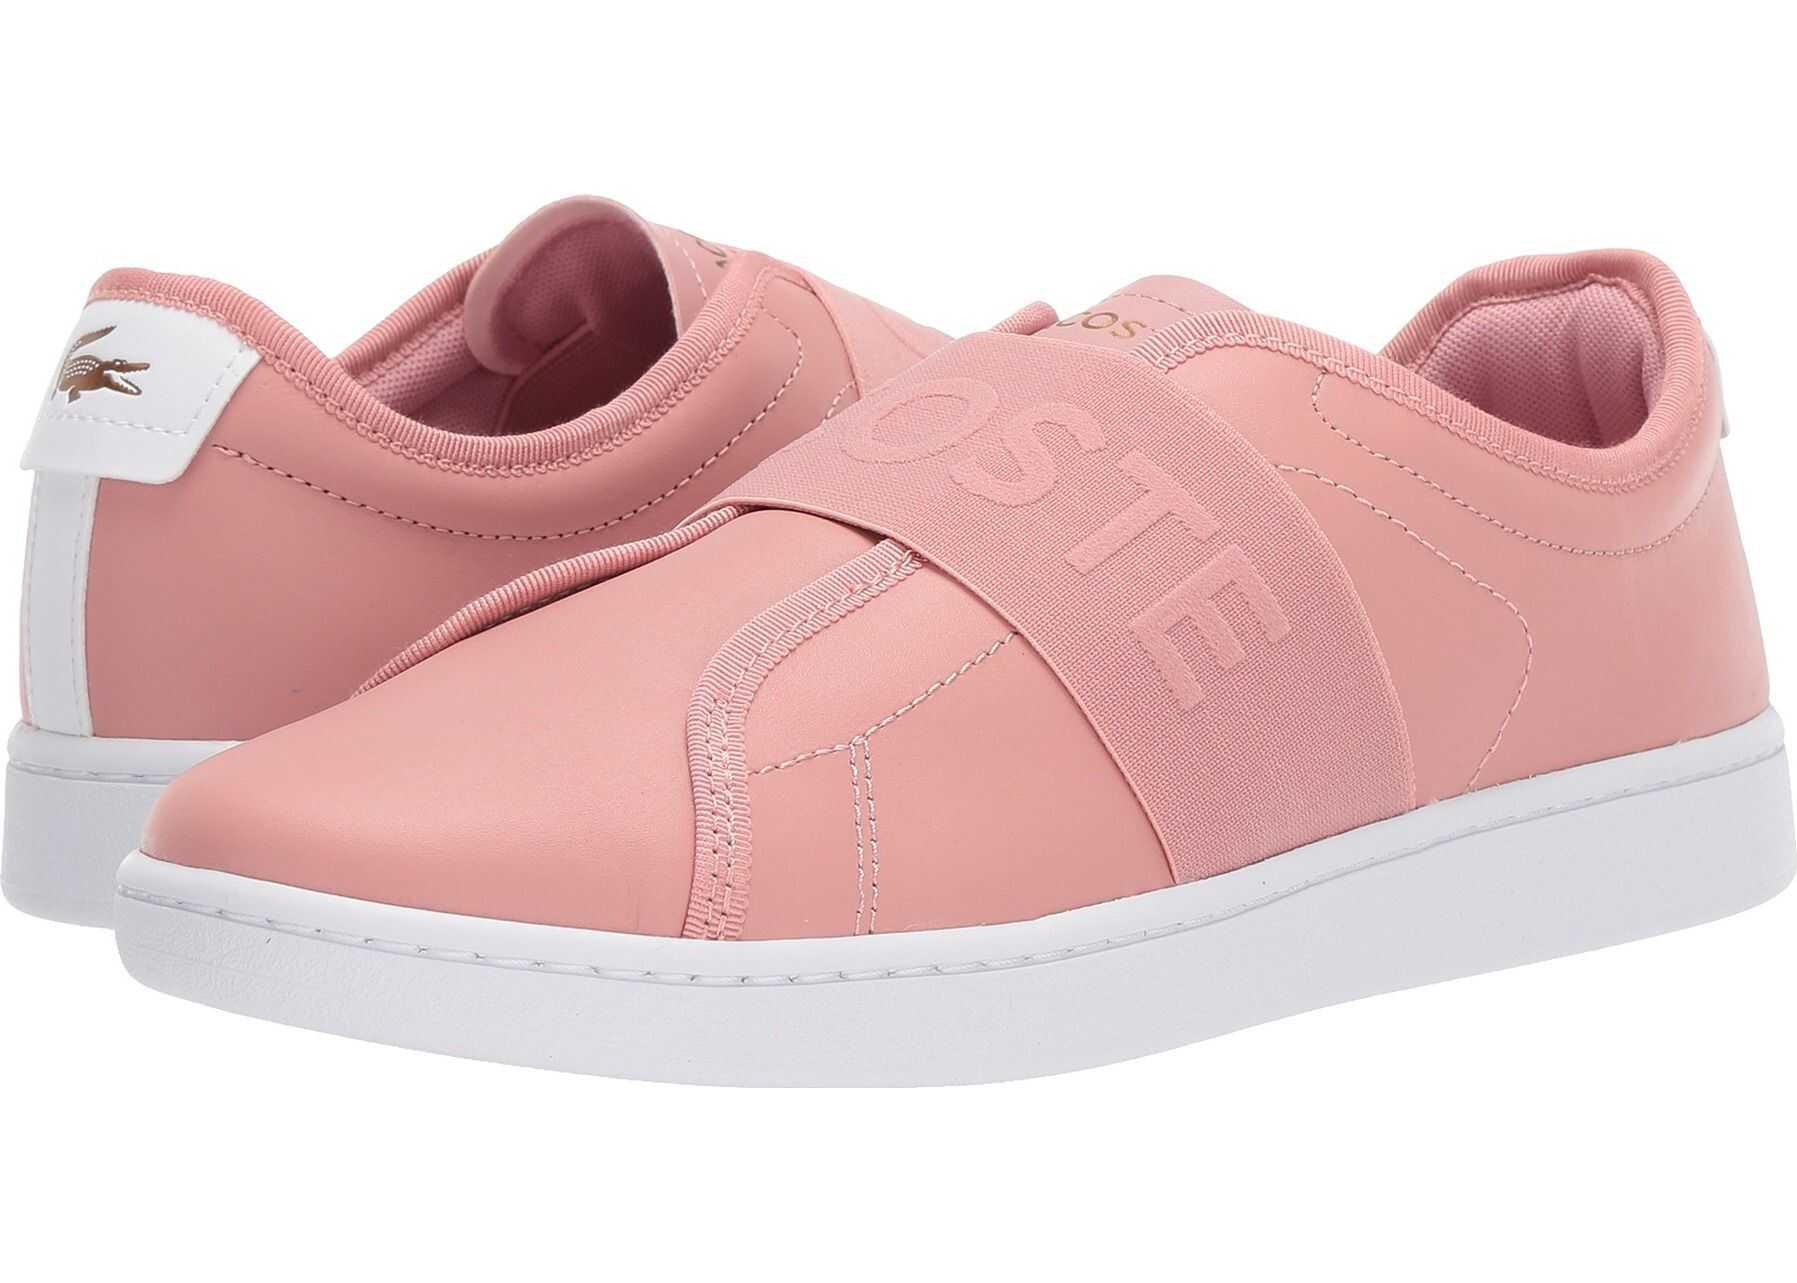 Lacoste Carnaby Evo Slip 318 1 Pink/White